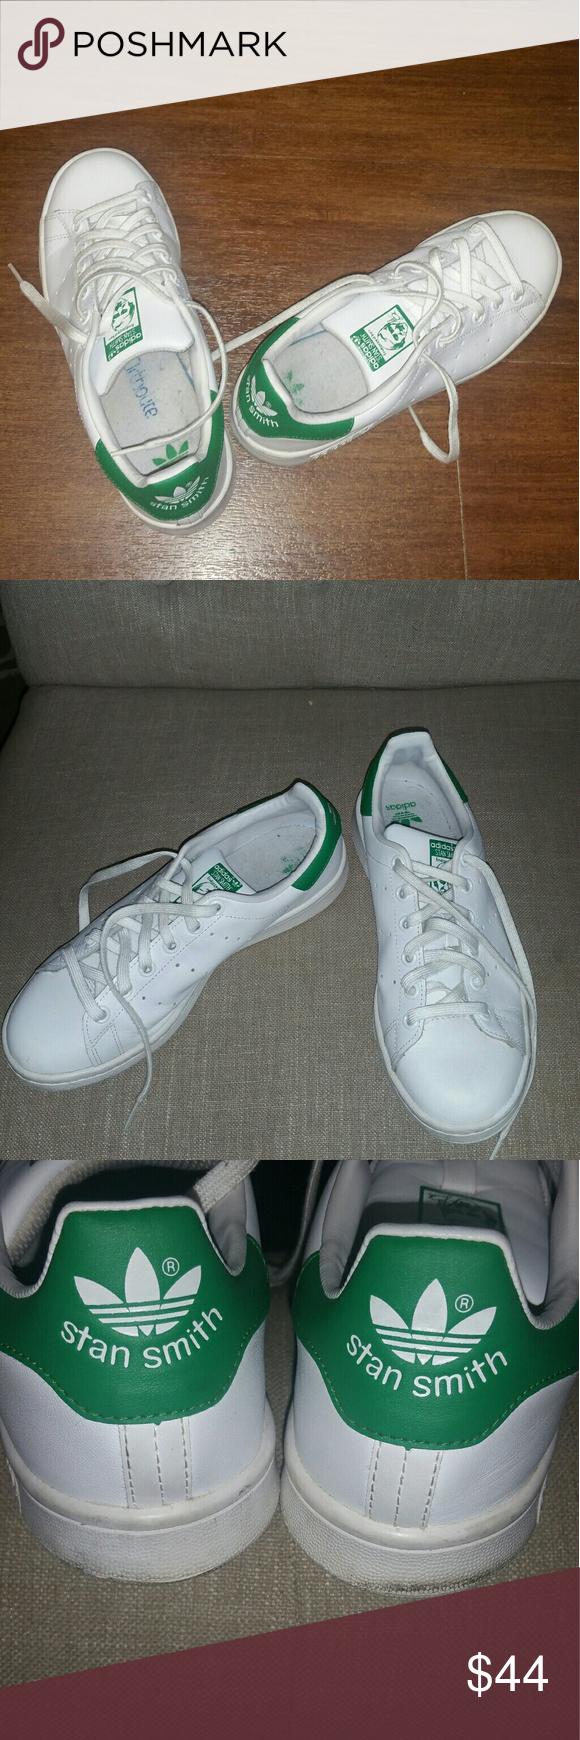 Adidas Donne Da Originale Stan Smith Scarpe Da Donne Tennis Sz 8 Stan Smith 2d3a37